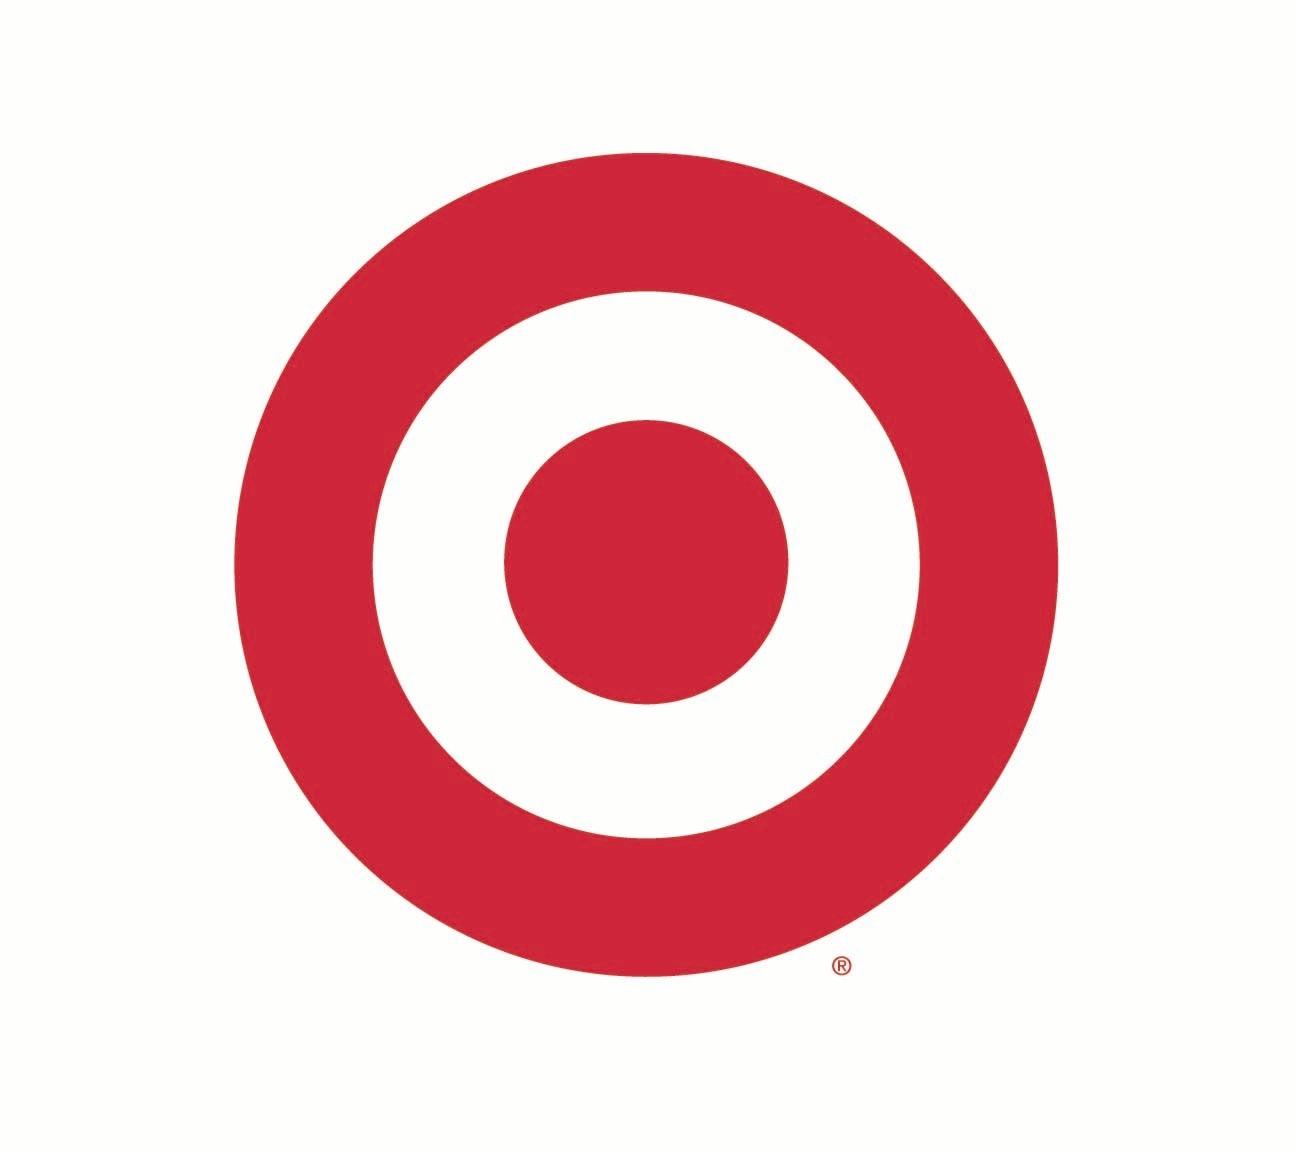 Clipart bullseye image Target bullseye